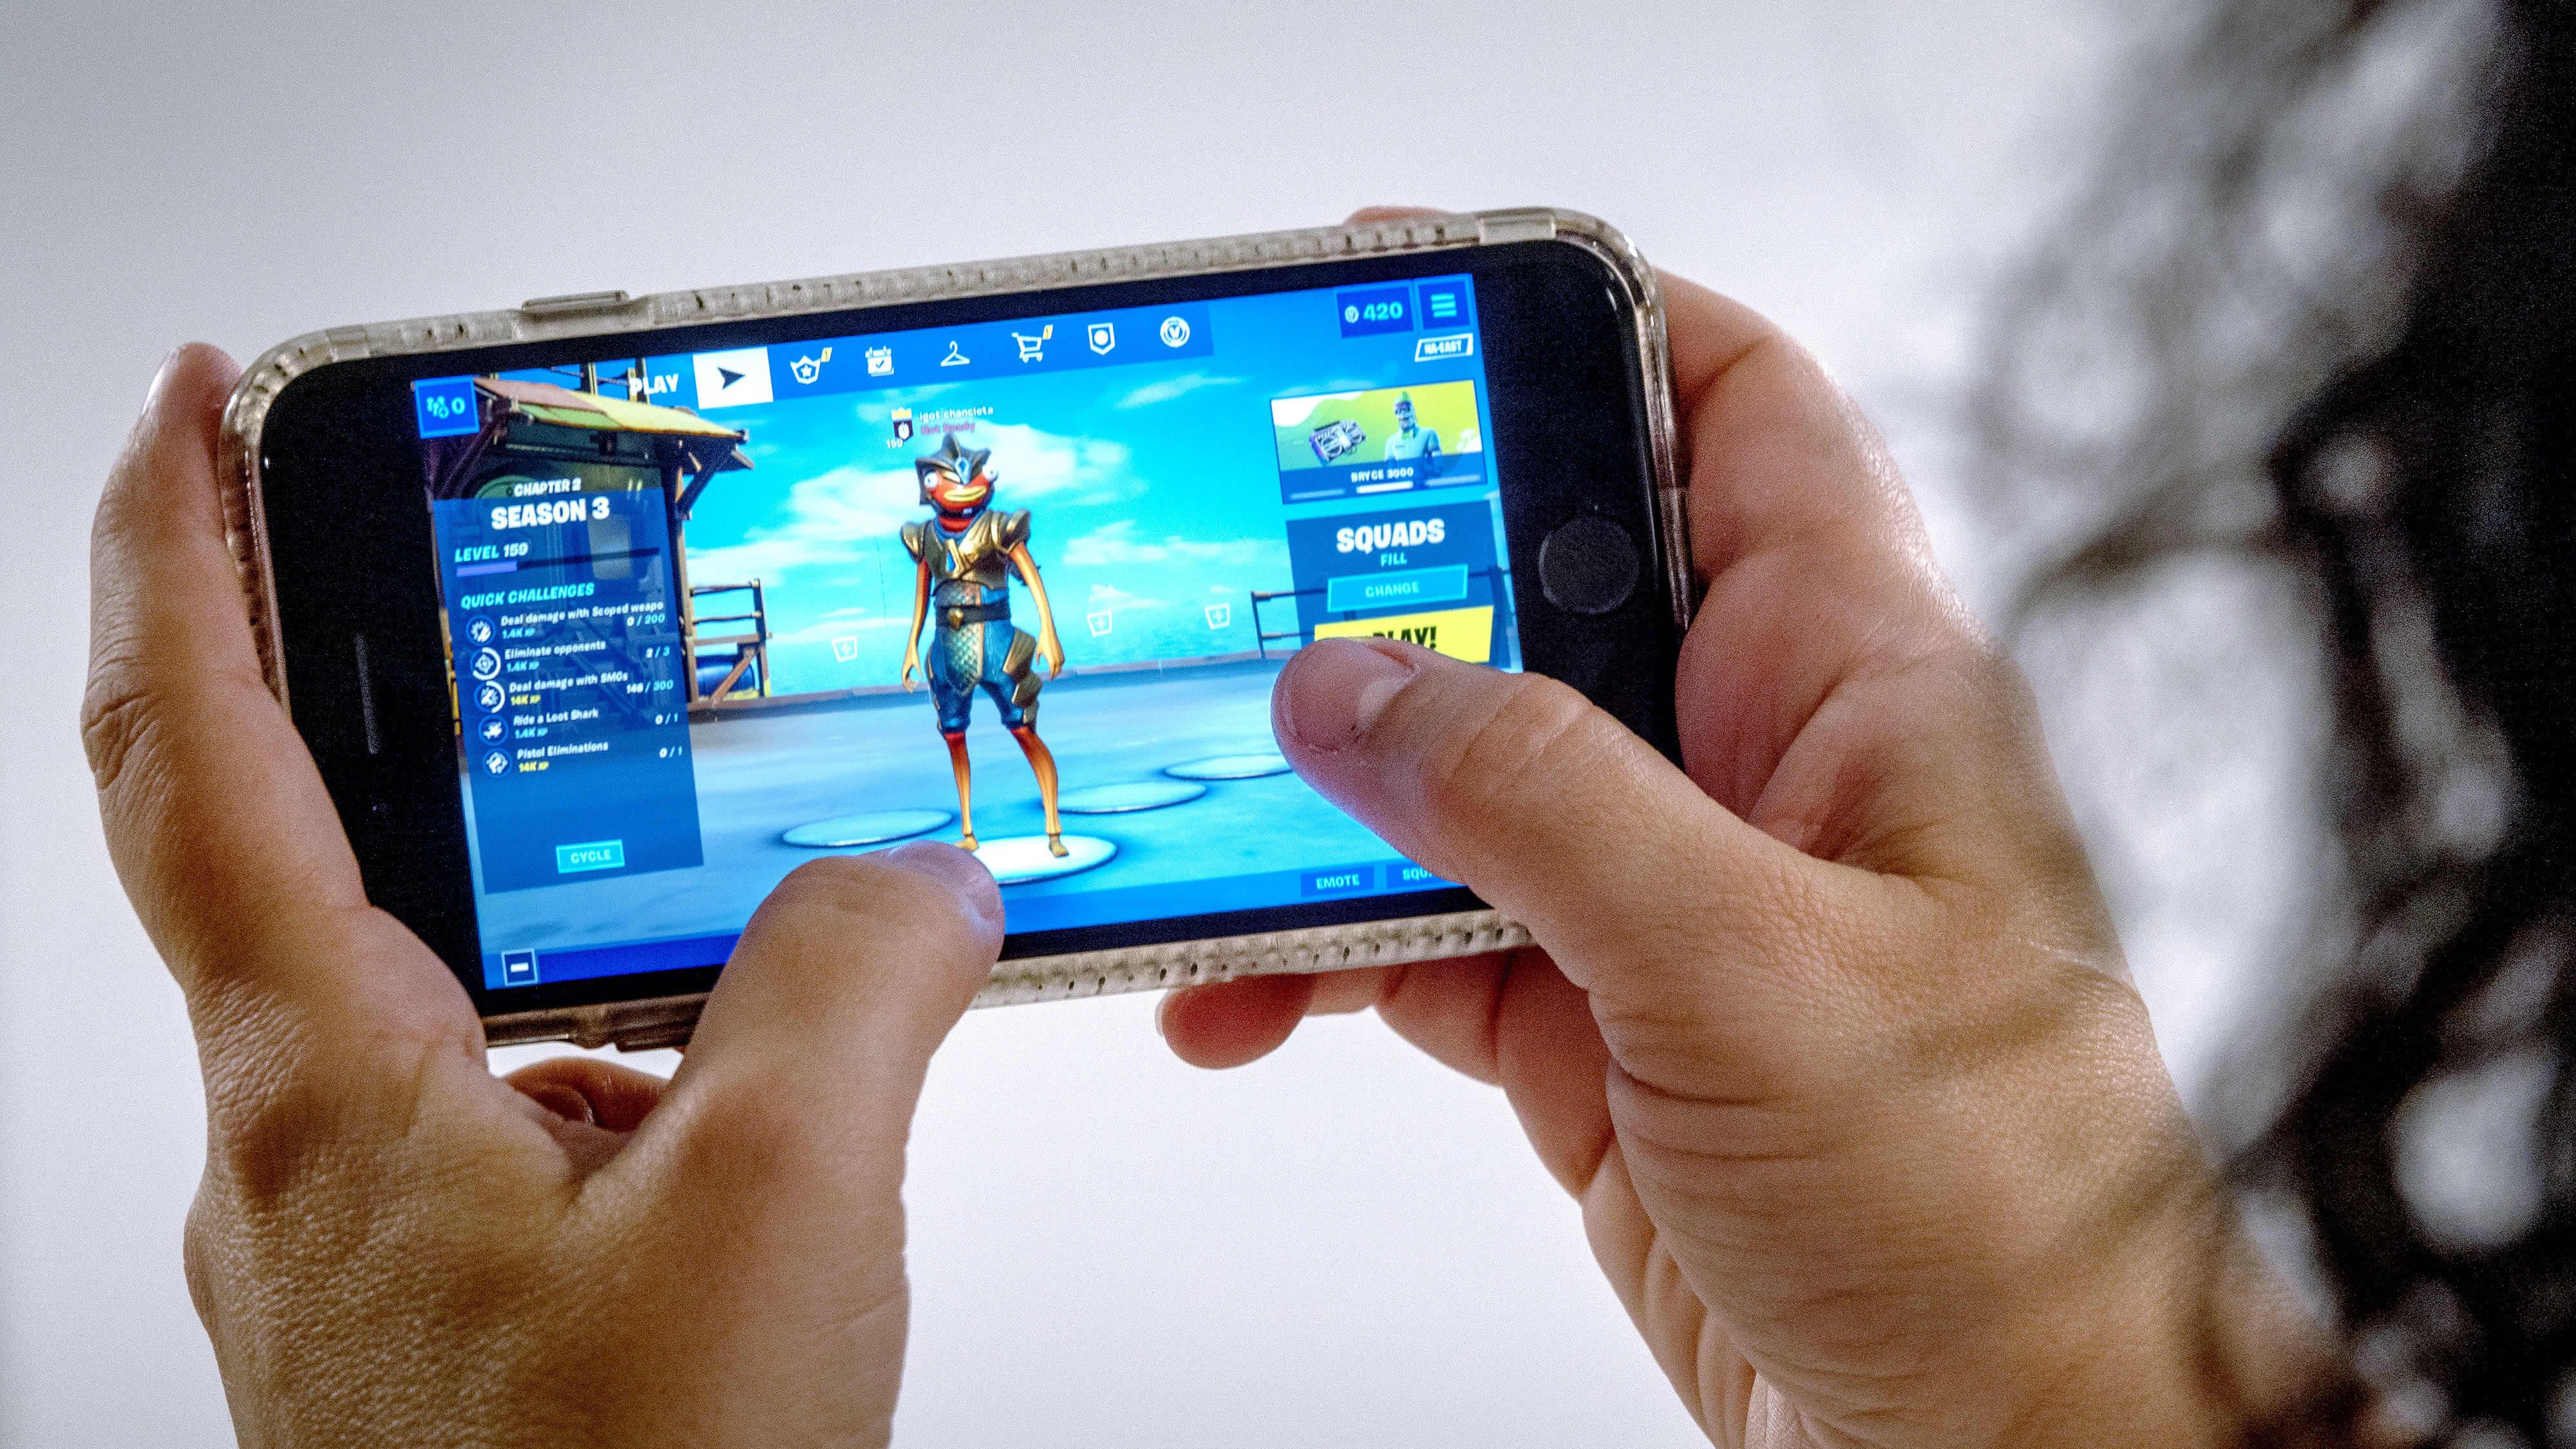 Henkilö pelaa Fortnite-peliä puhelimella